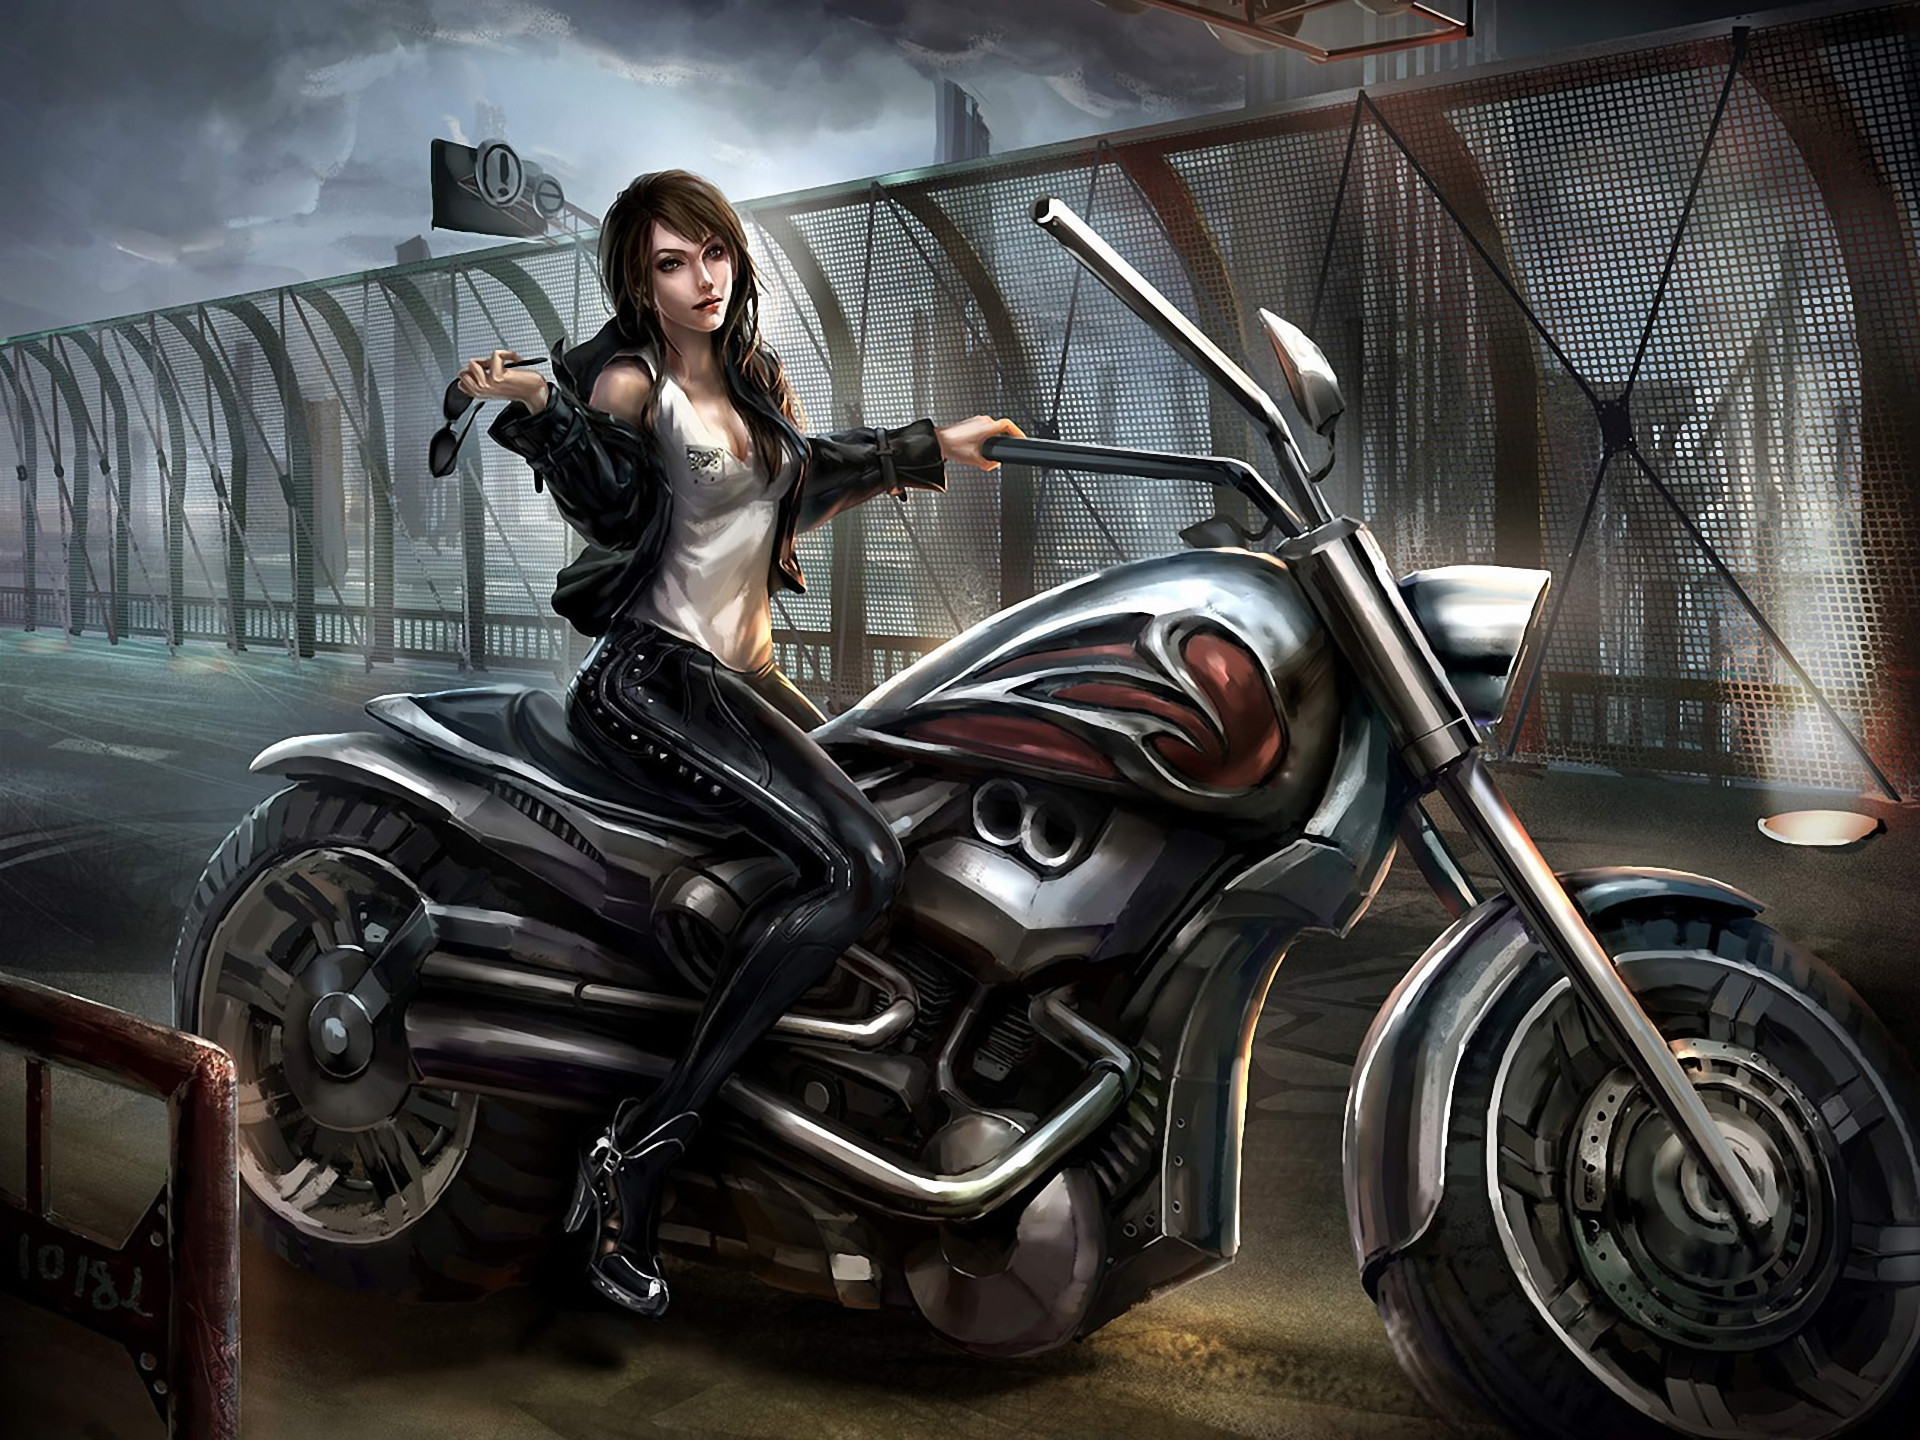 Art girl motorcycle goggles latex bridge girls original wallpaper      84776   WallpaperUP